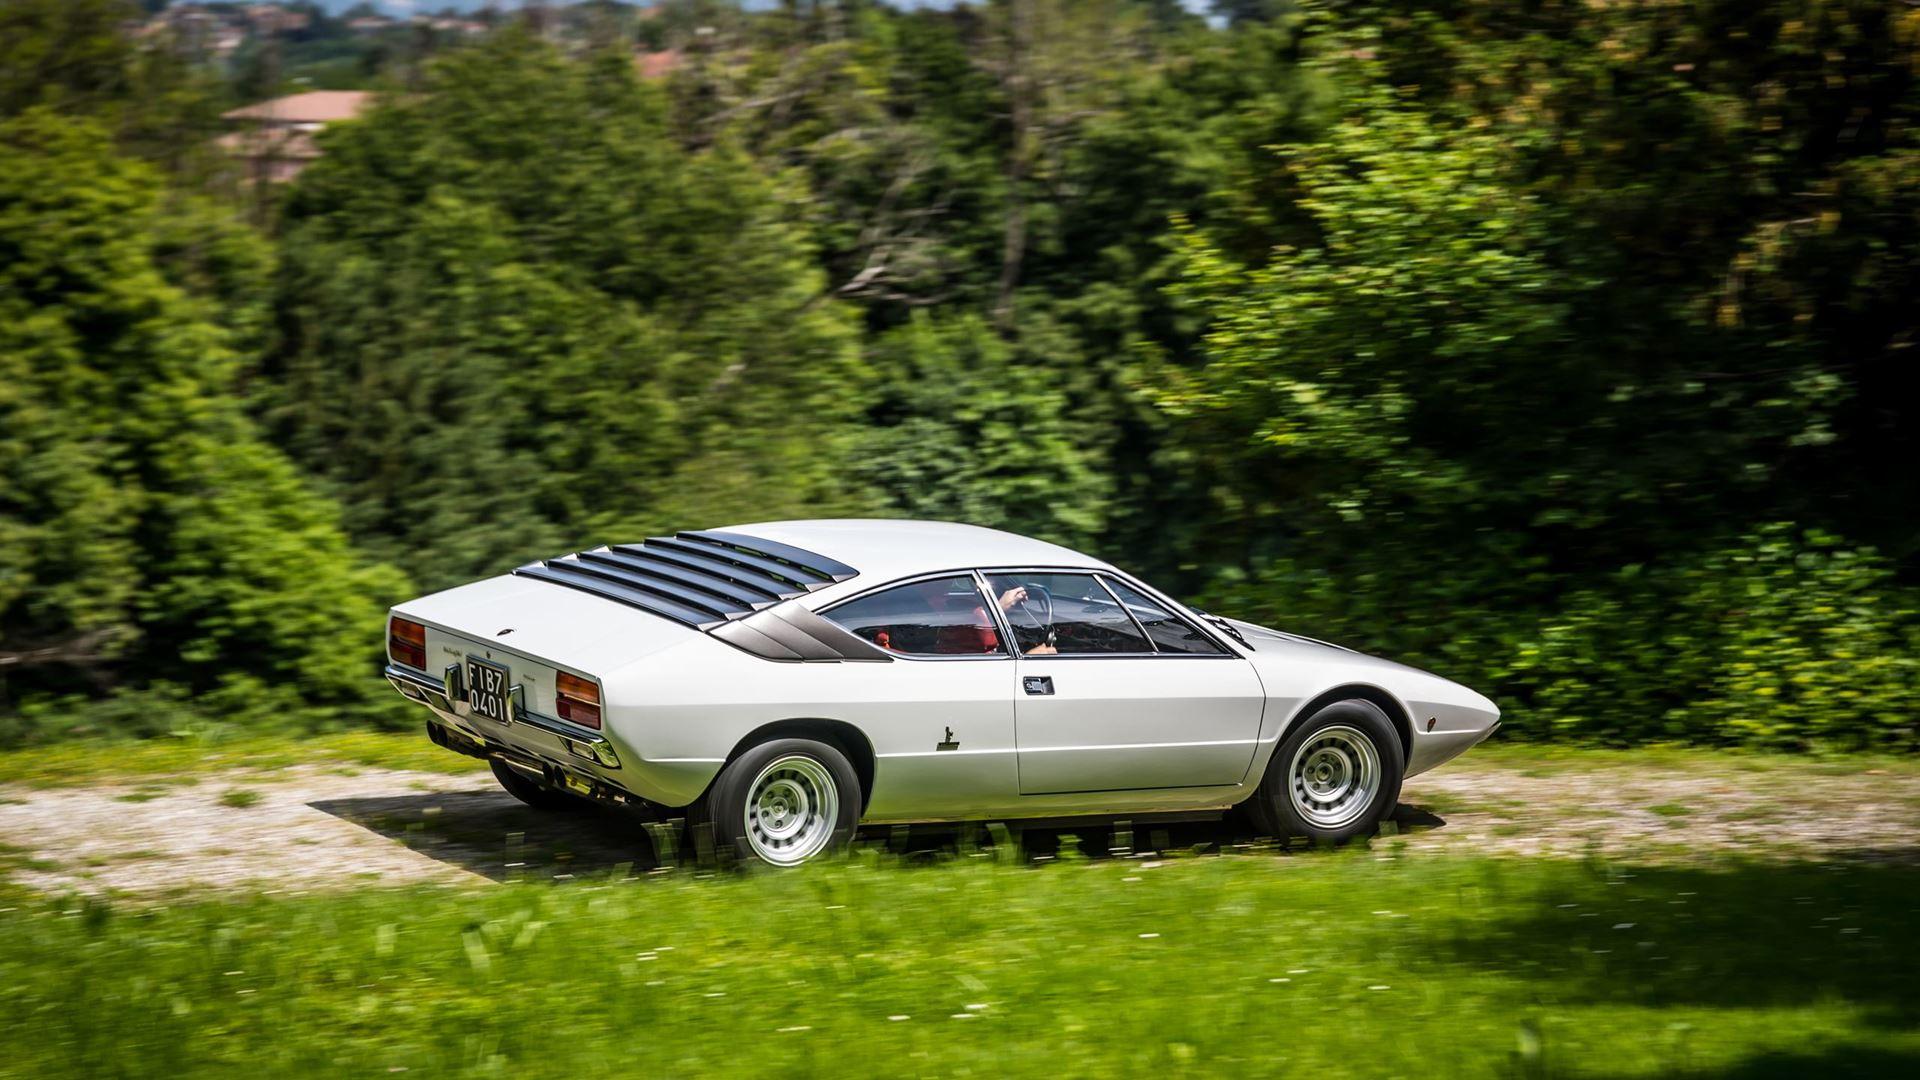 Lamborghini celebrates the 50th Anniversary of the Urraco - Image 2